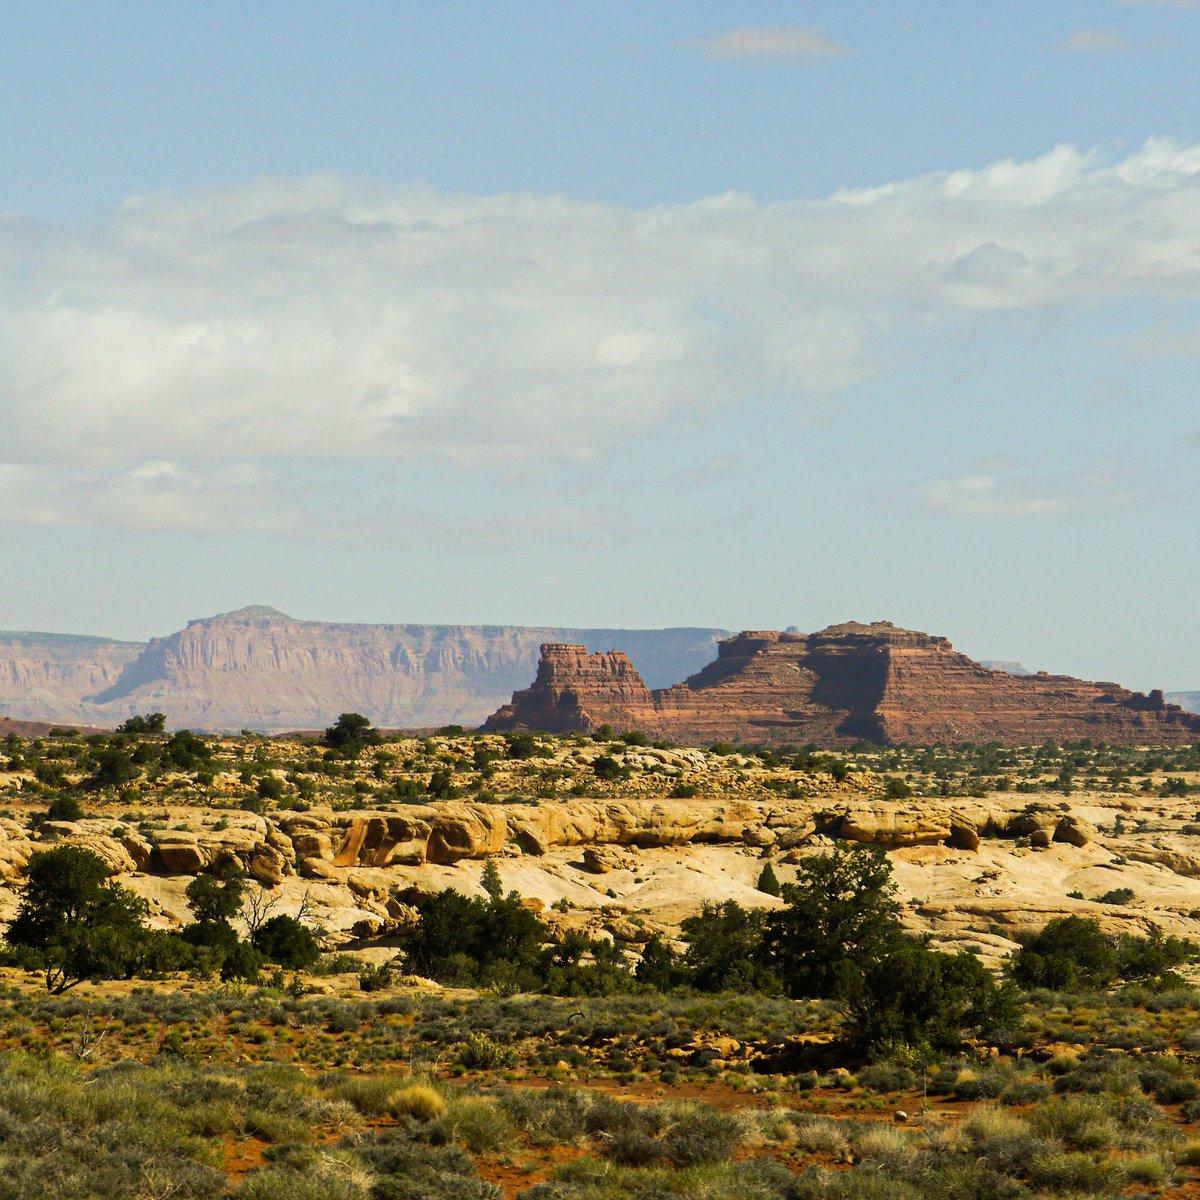 Scenic image of canyonlands in Utah